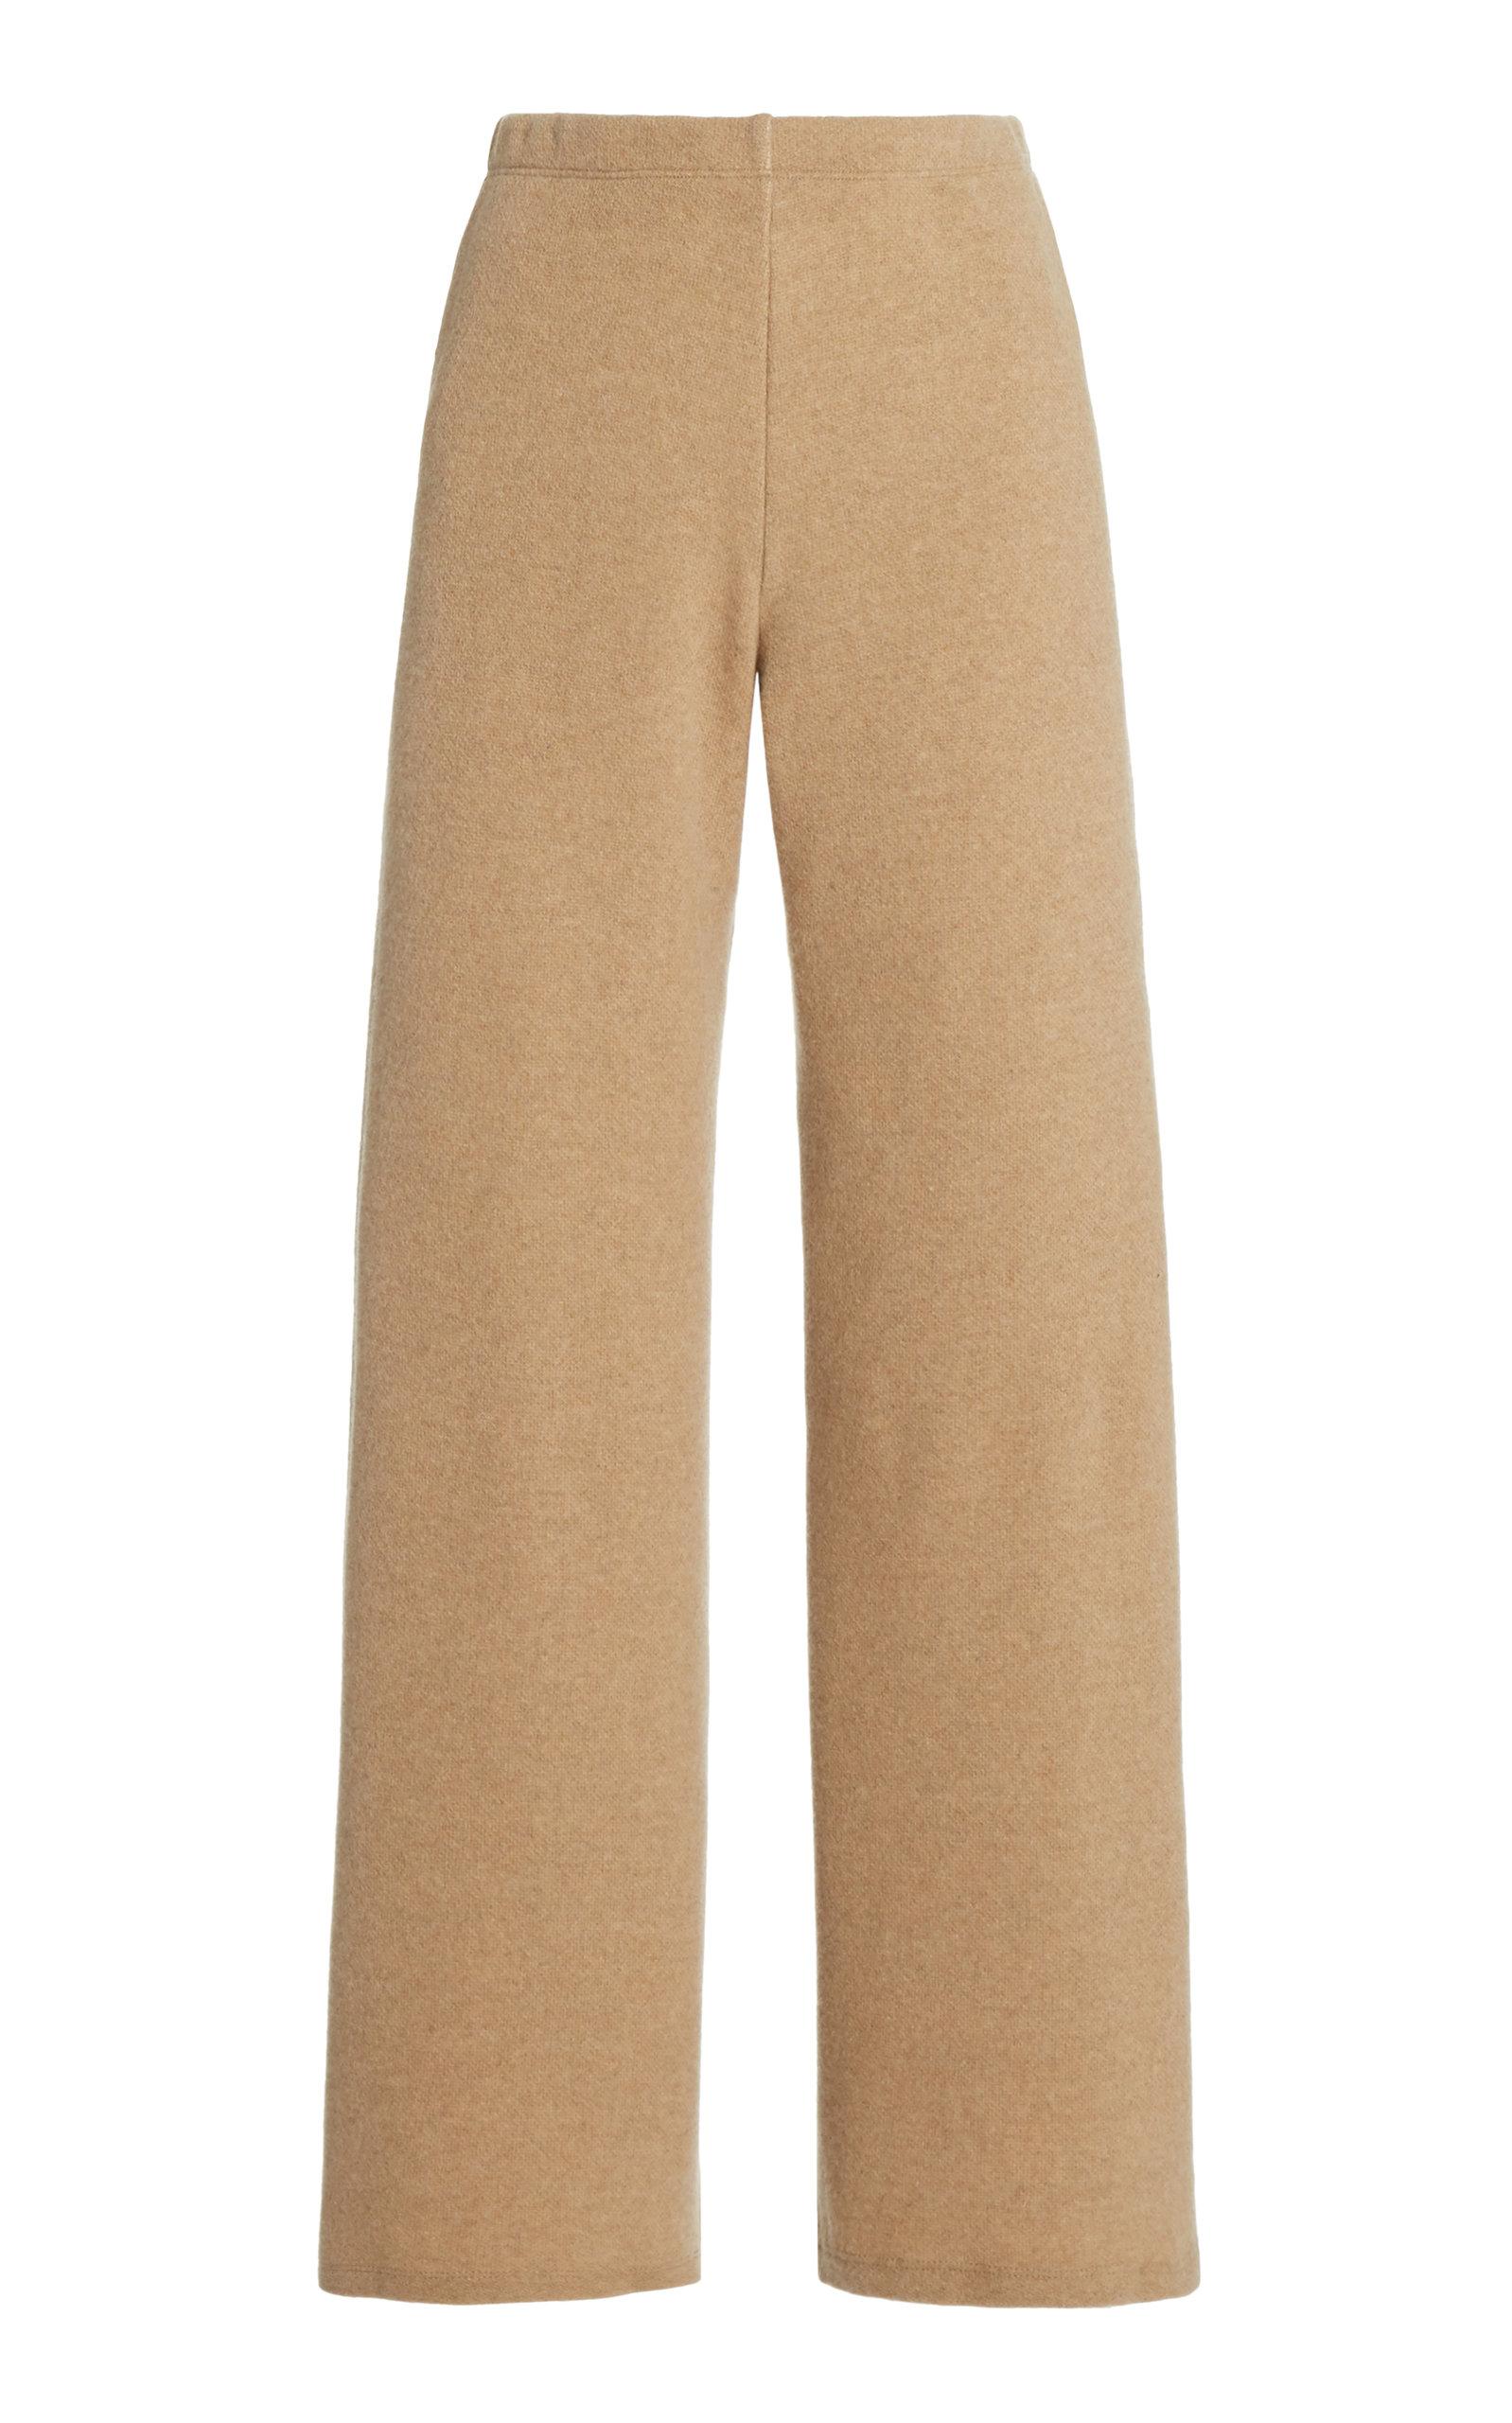 LESET SIERRA WOOL-BLEND WIDE-LEG PANTS